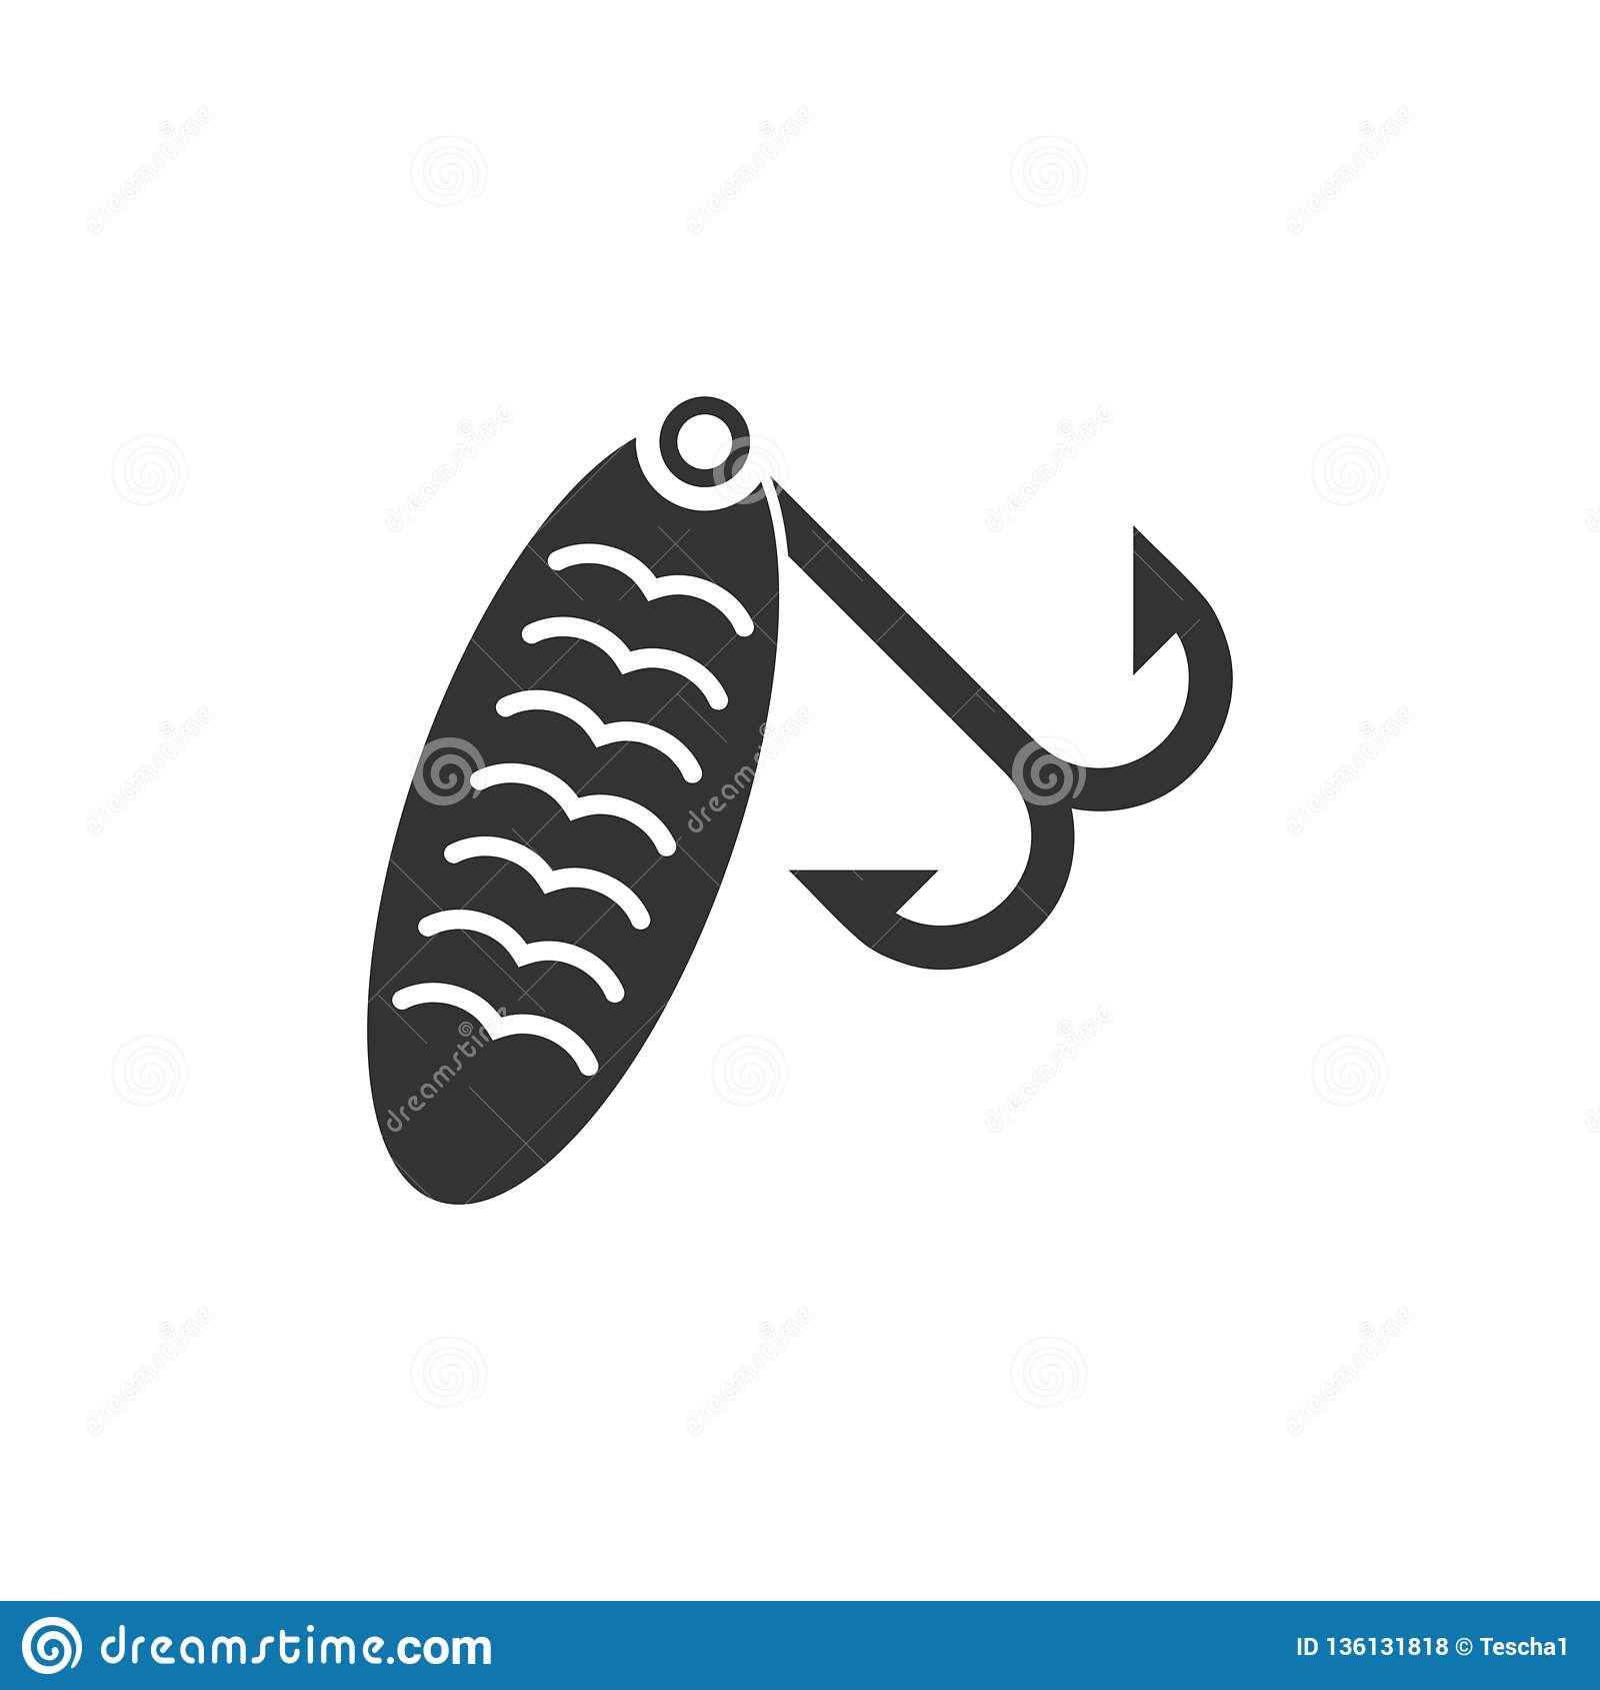 Fishing tackle icon flat